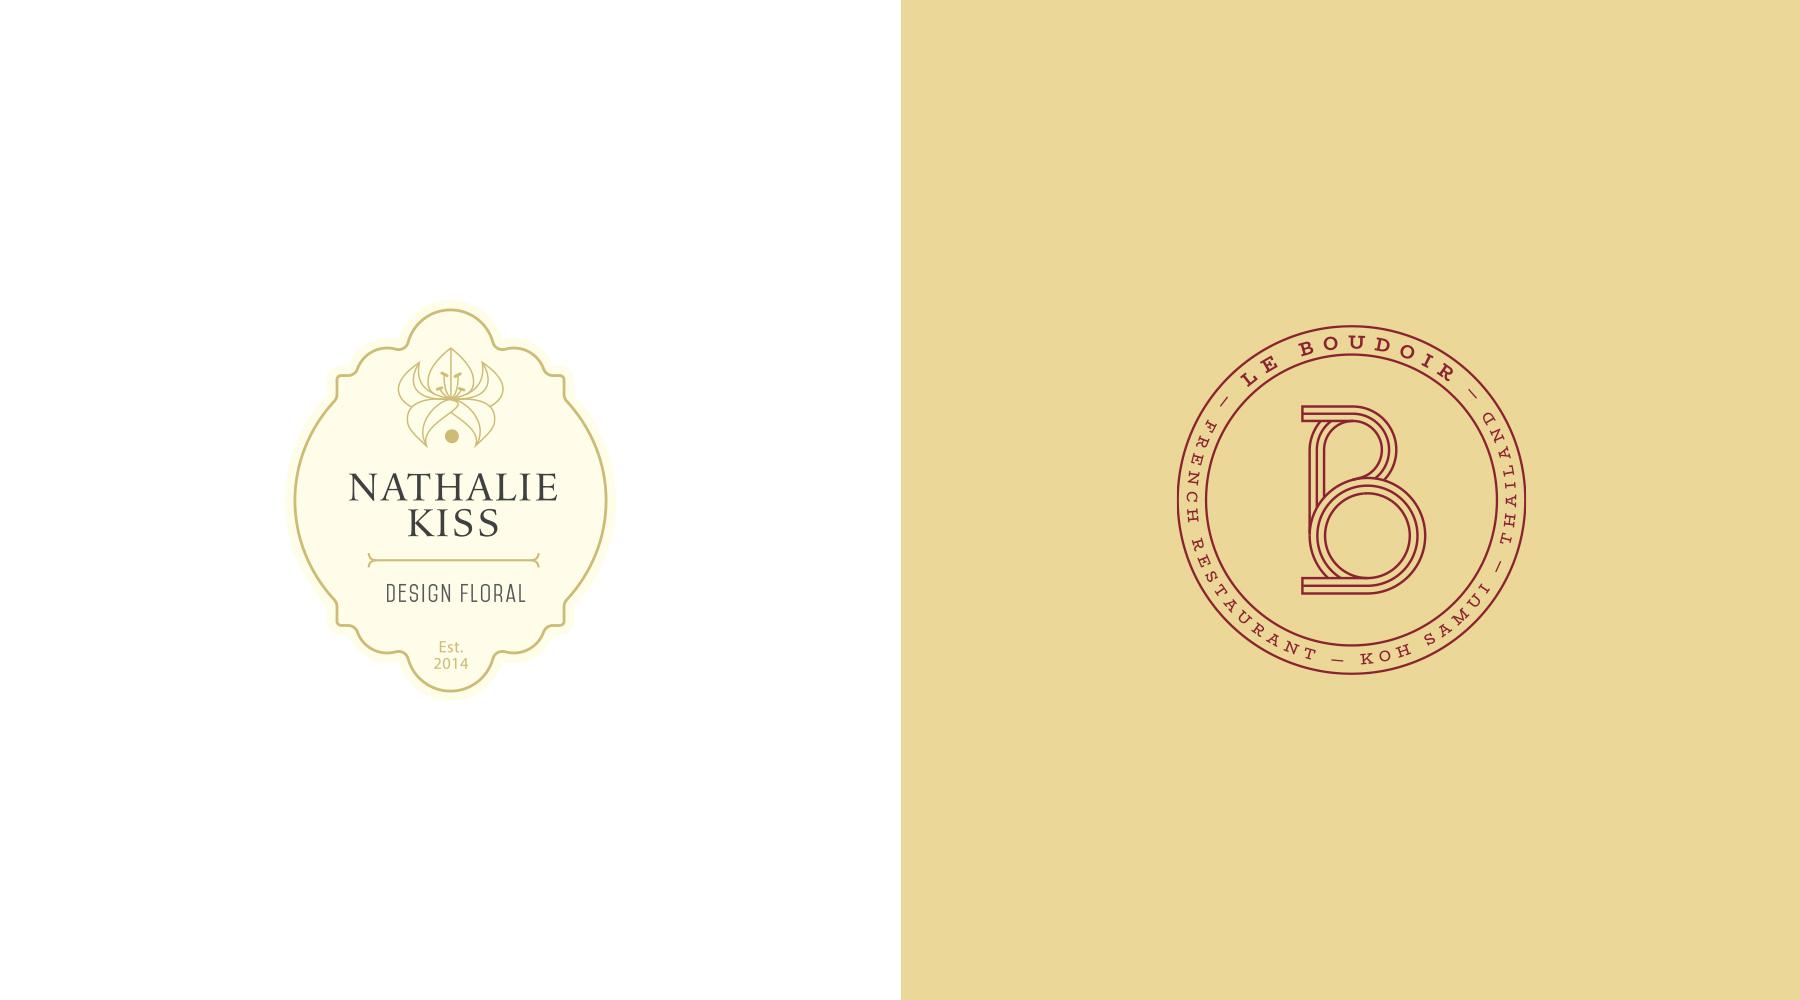 Logo Nathalie Kiss, Logo Le boudoir